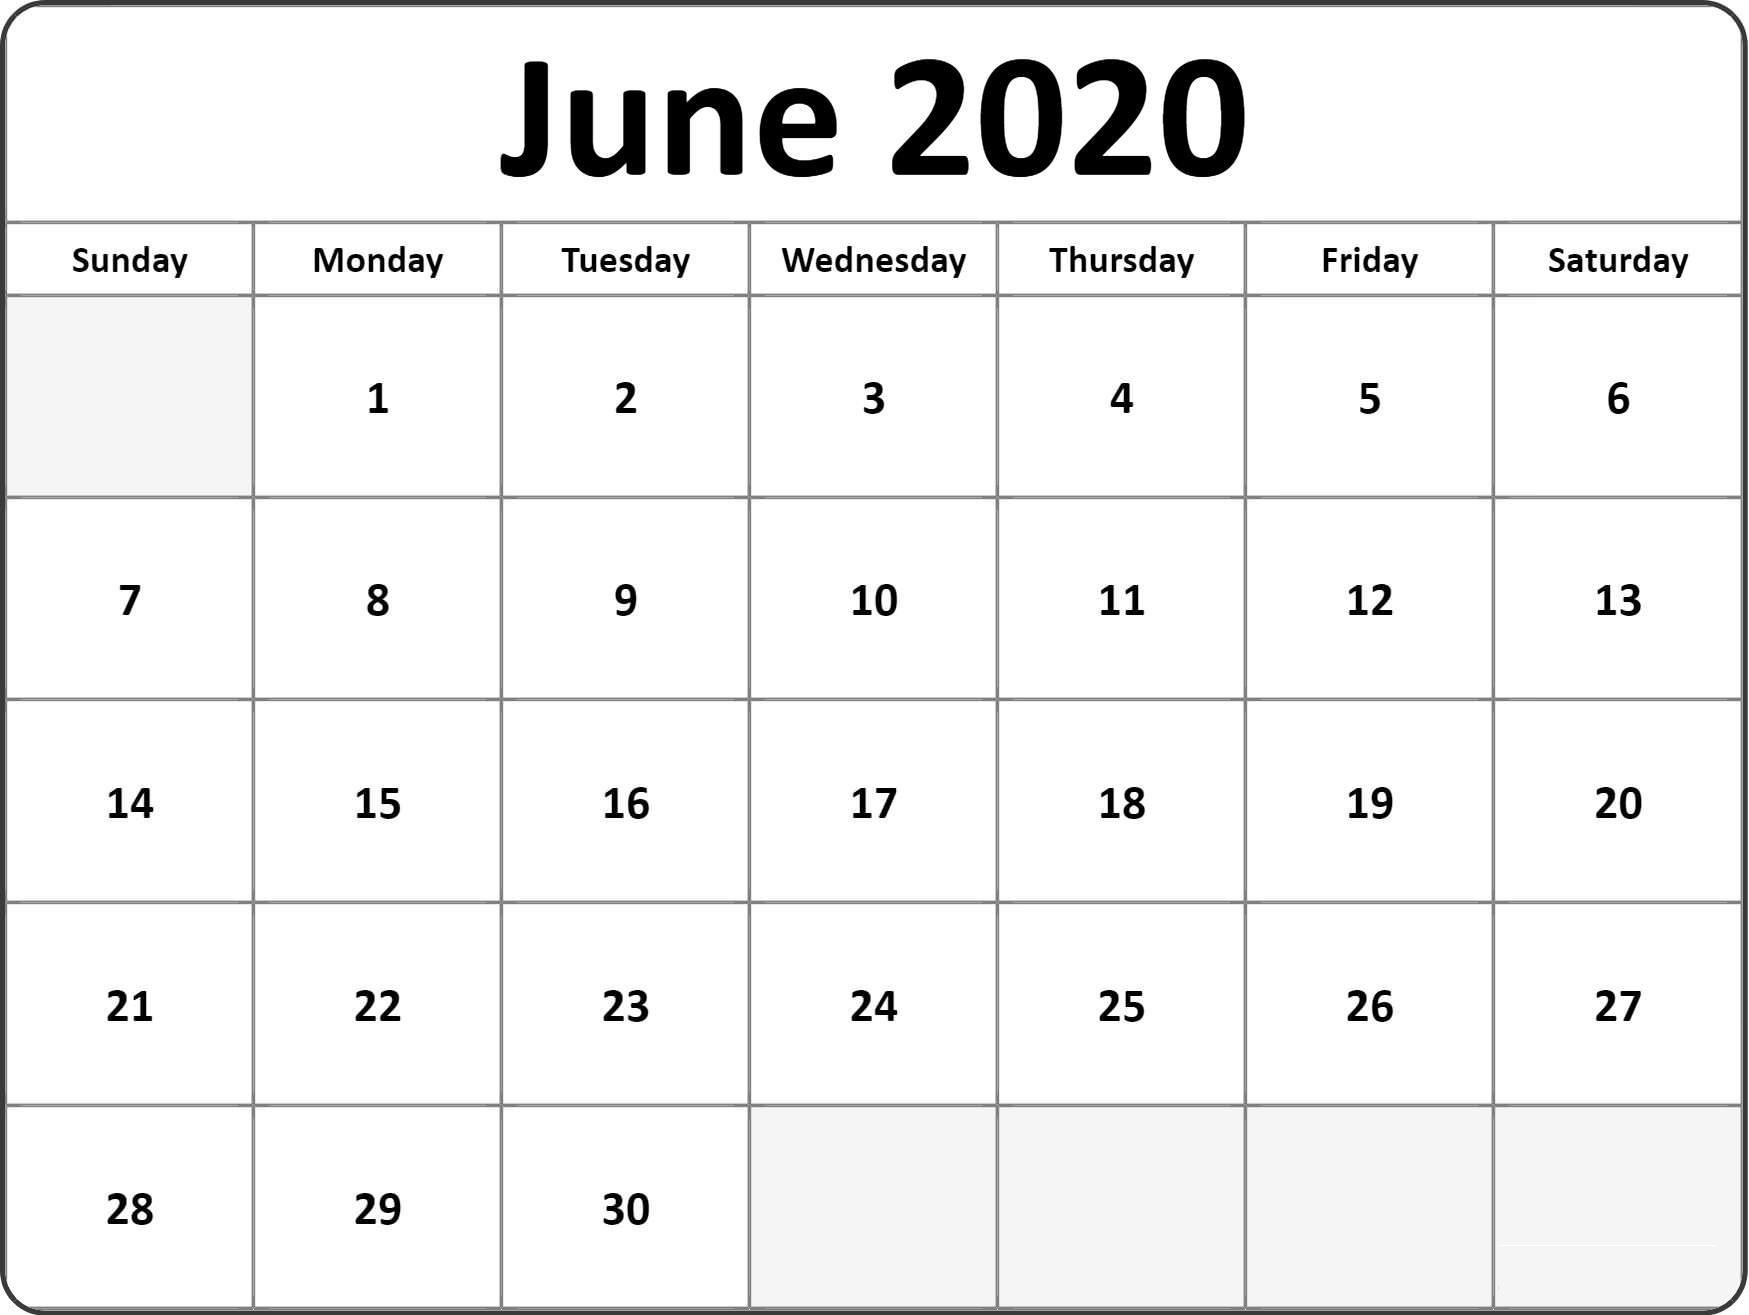 June 2020 Calendar PrintableJune 2020 Calendar Printable